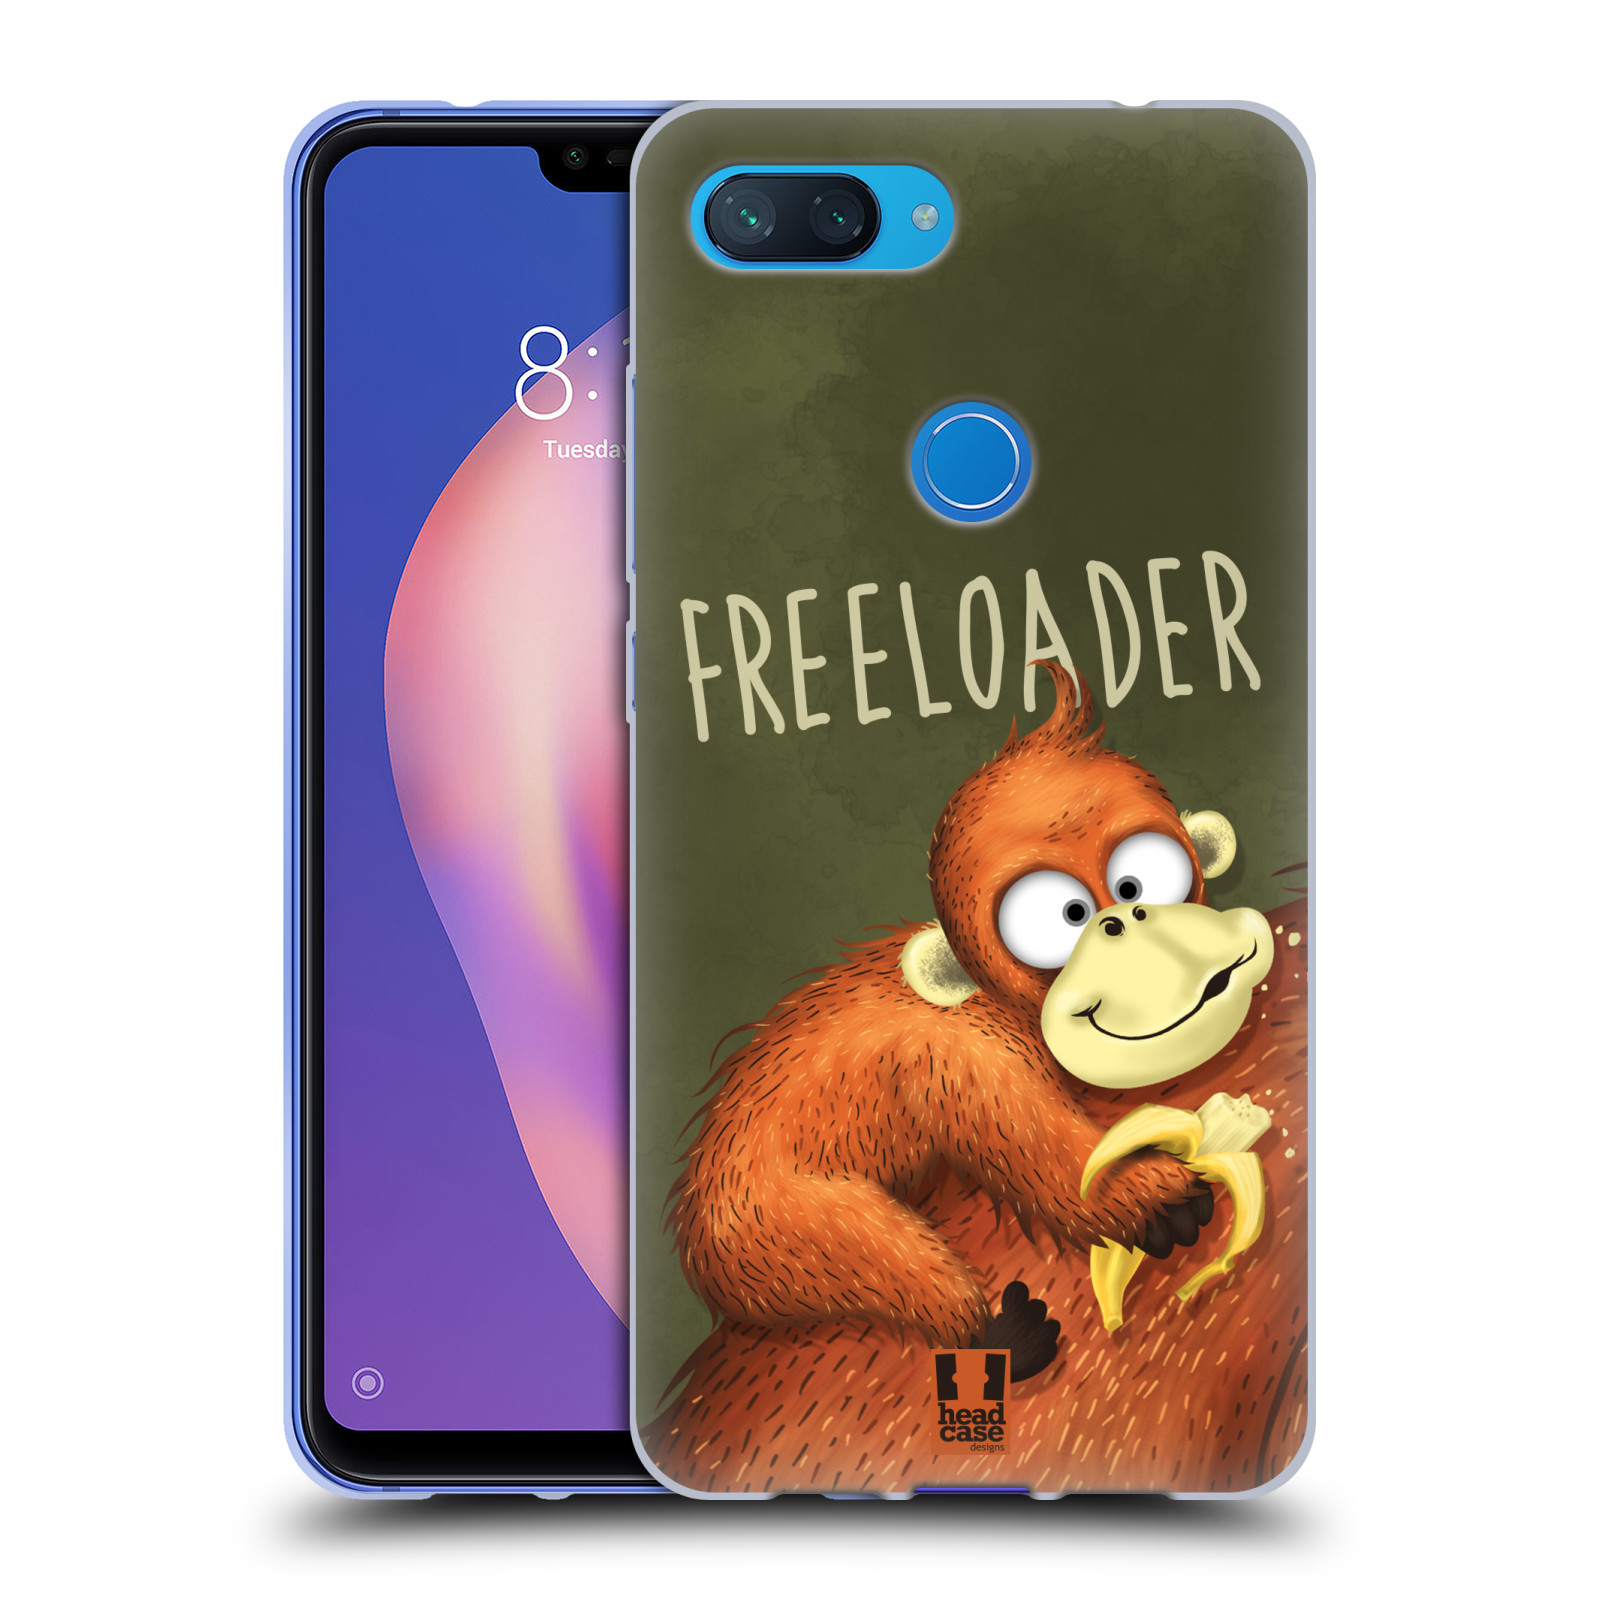 Silikonové pouzdro na mobil Xiaomi Mi 8 Lite - Head Case - Opičák Freeloader